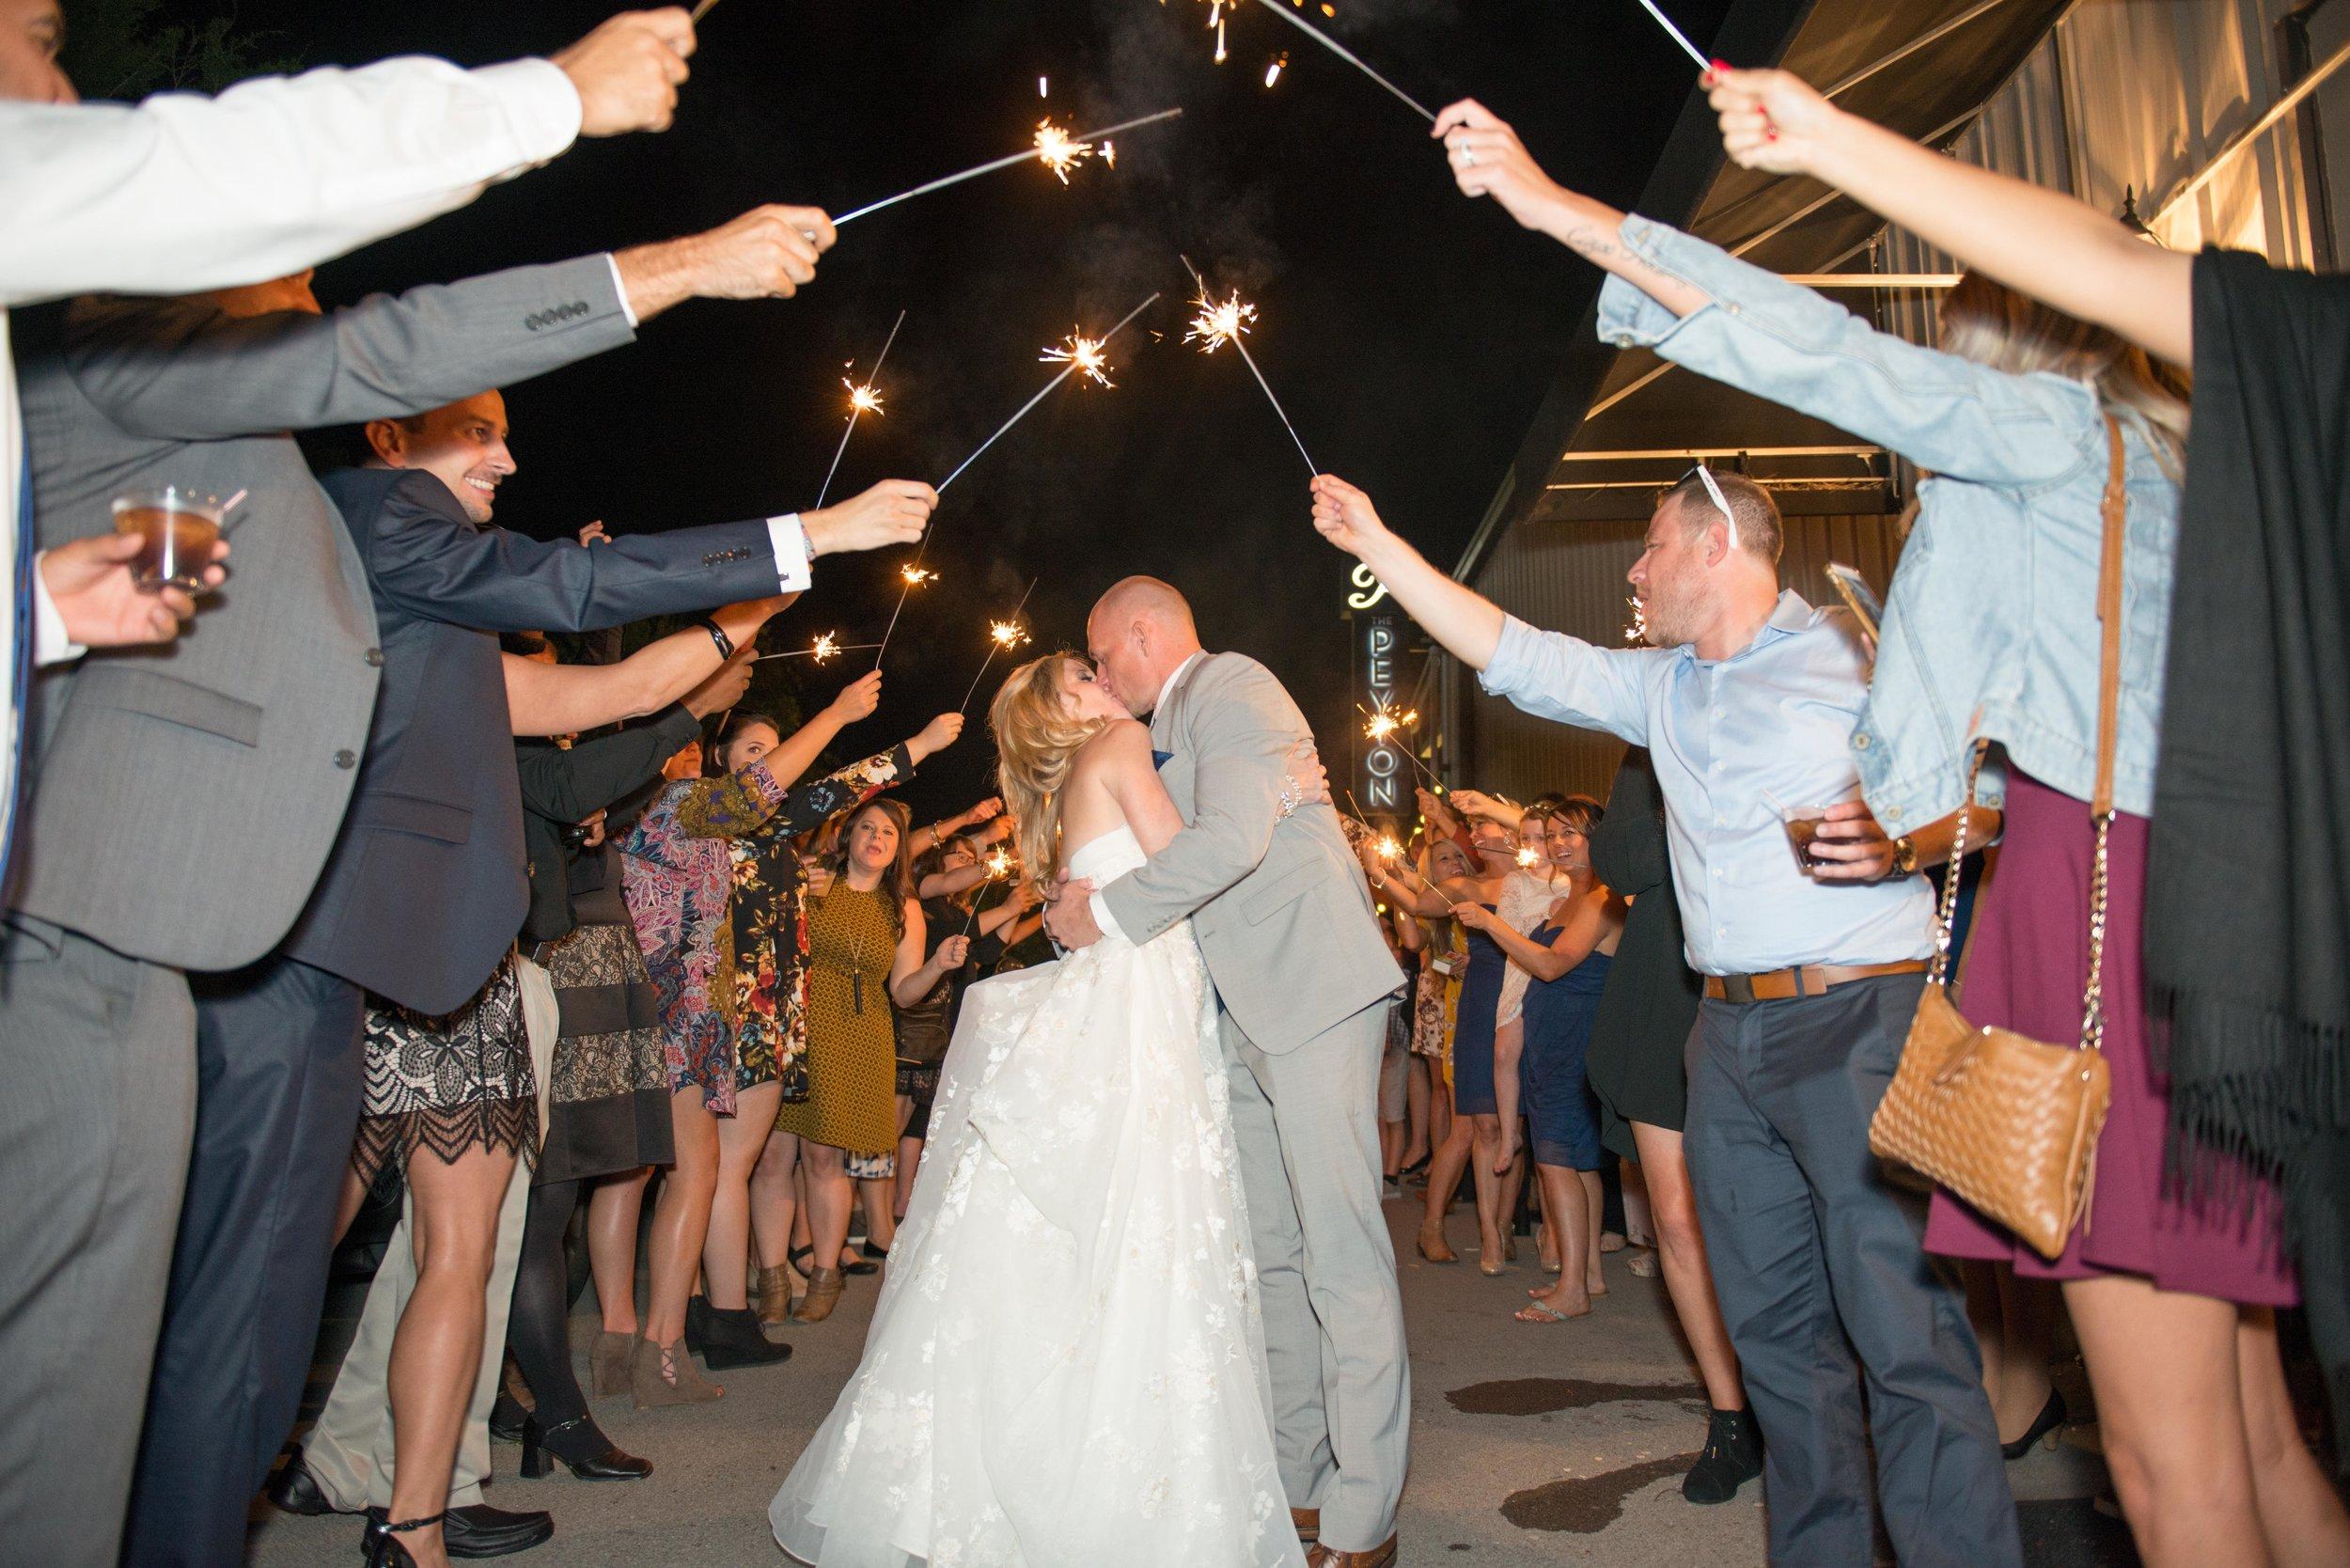 00001_Kuhnert-Wedding-121.jpg